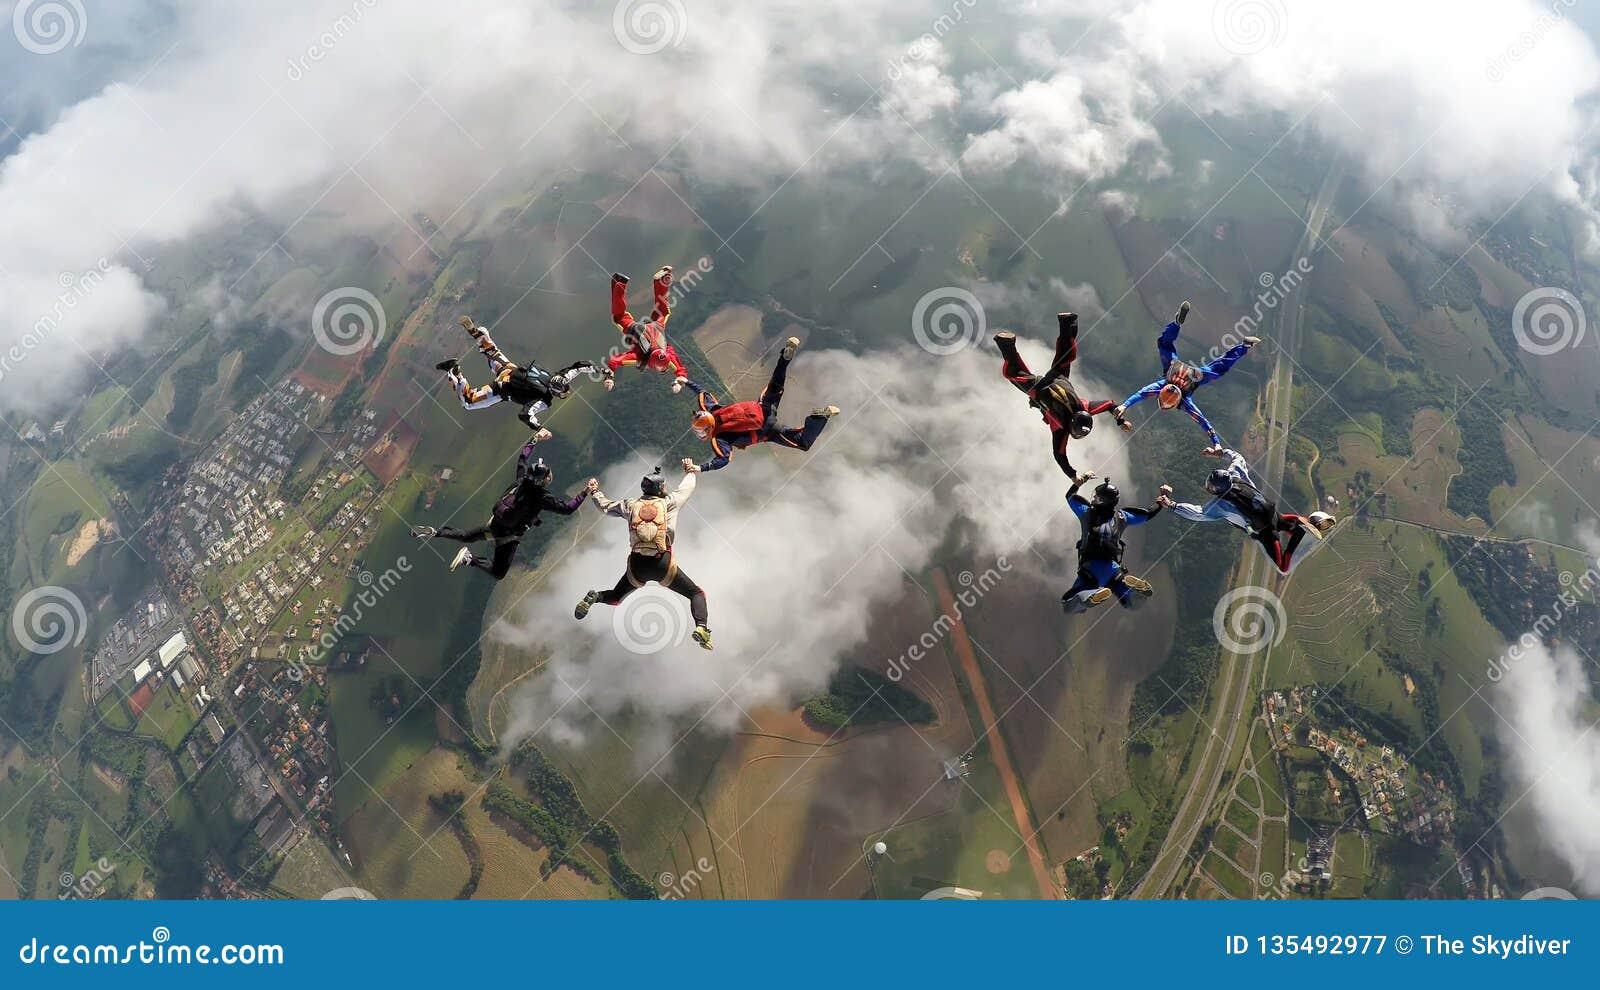 Skydivers making two circles